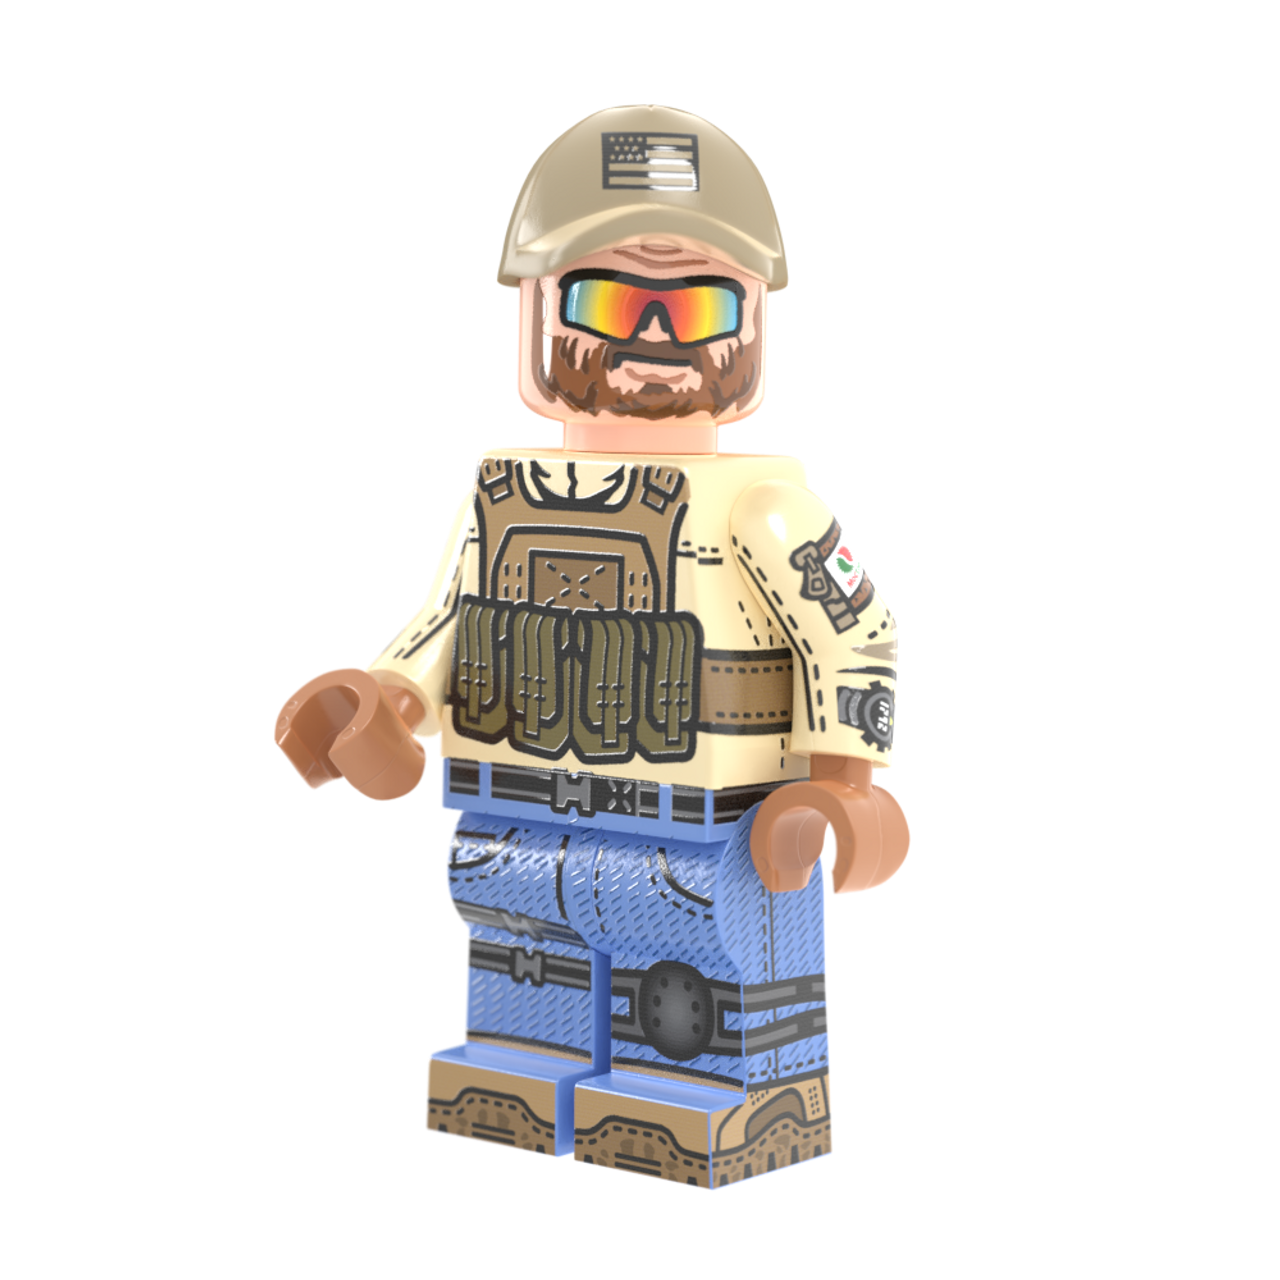 PMC Operator